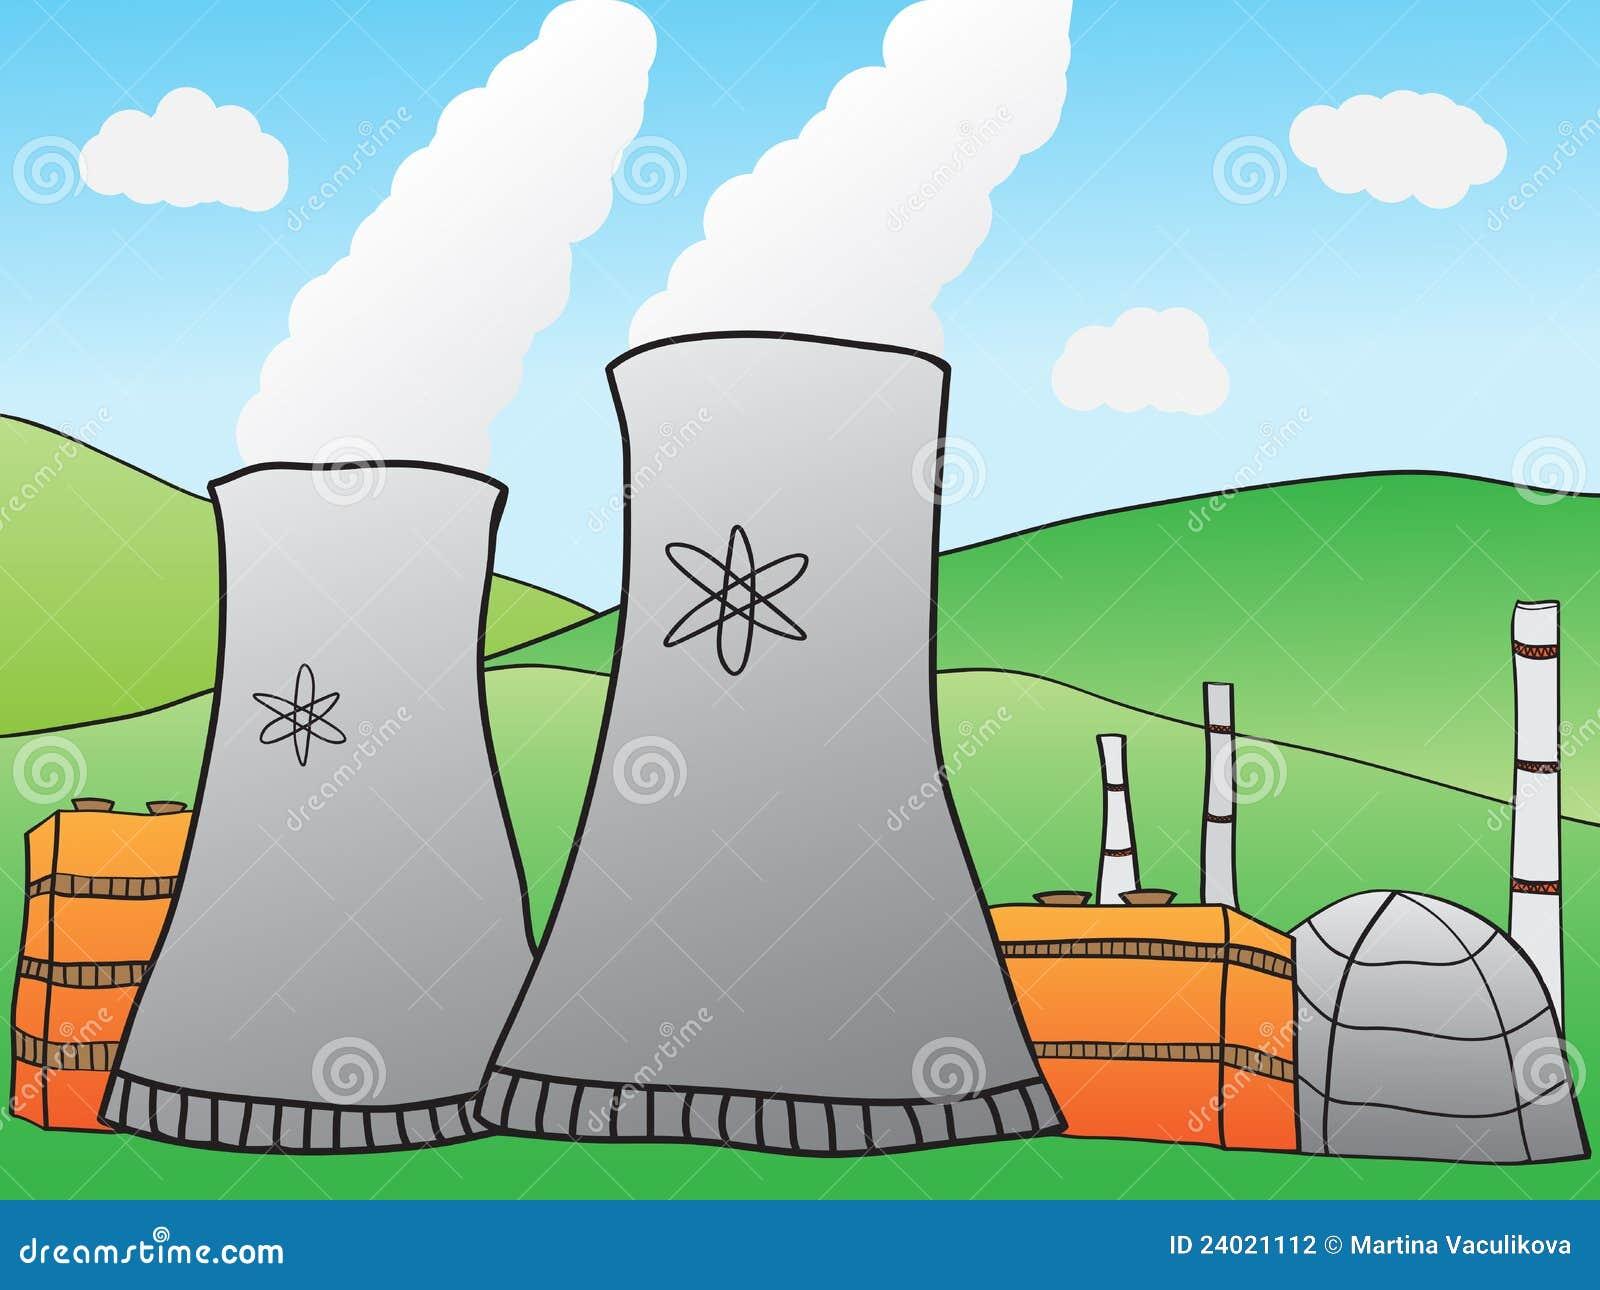 atomkraftwerk clipart - photo #21